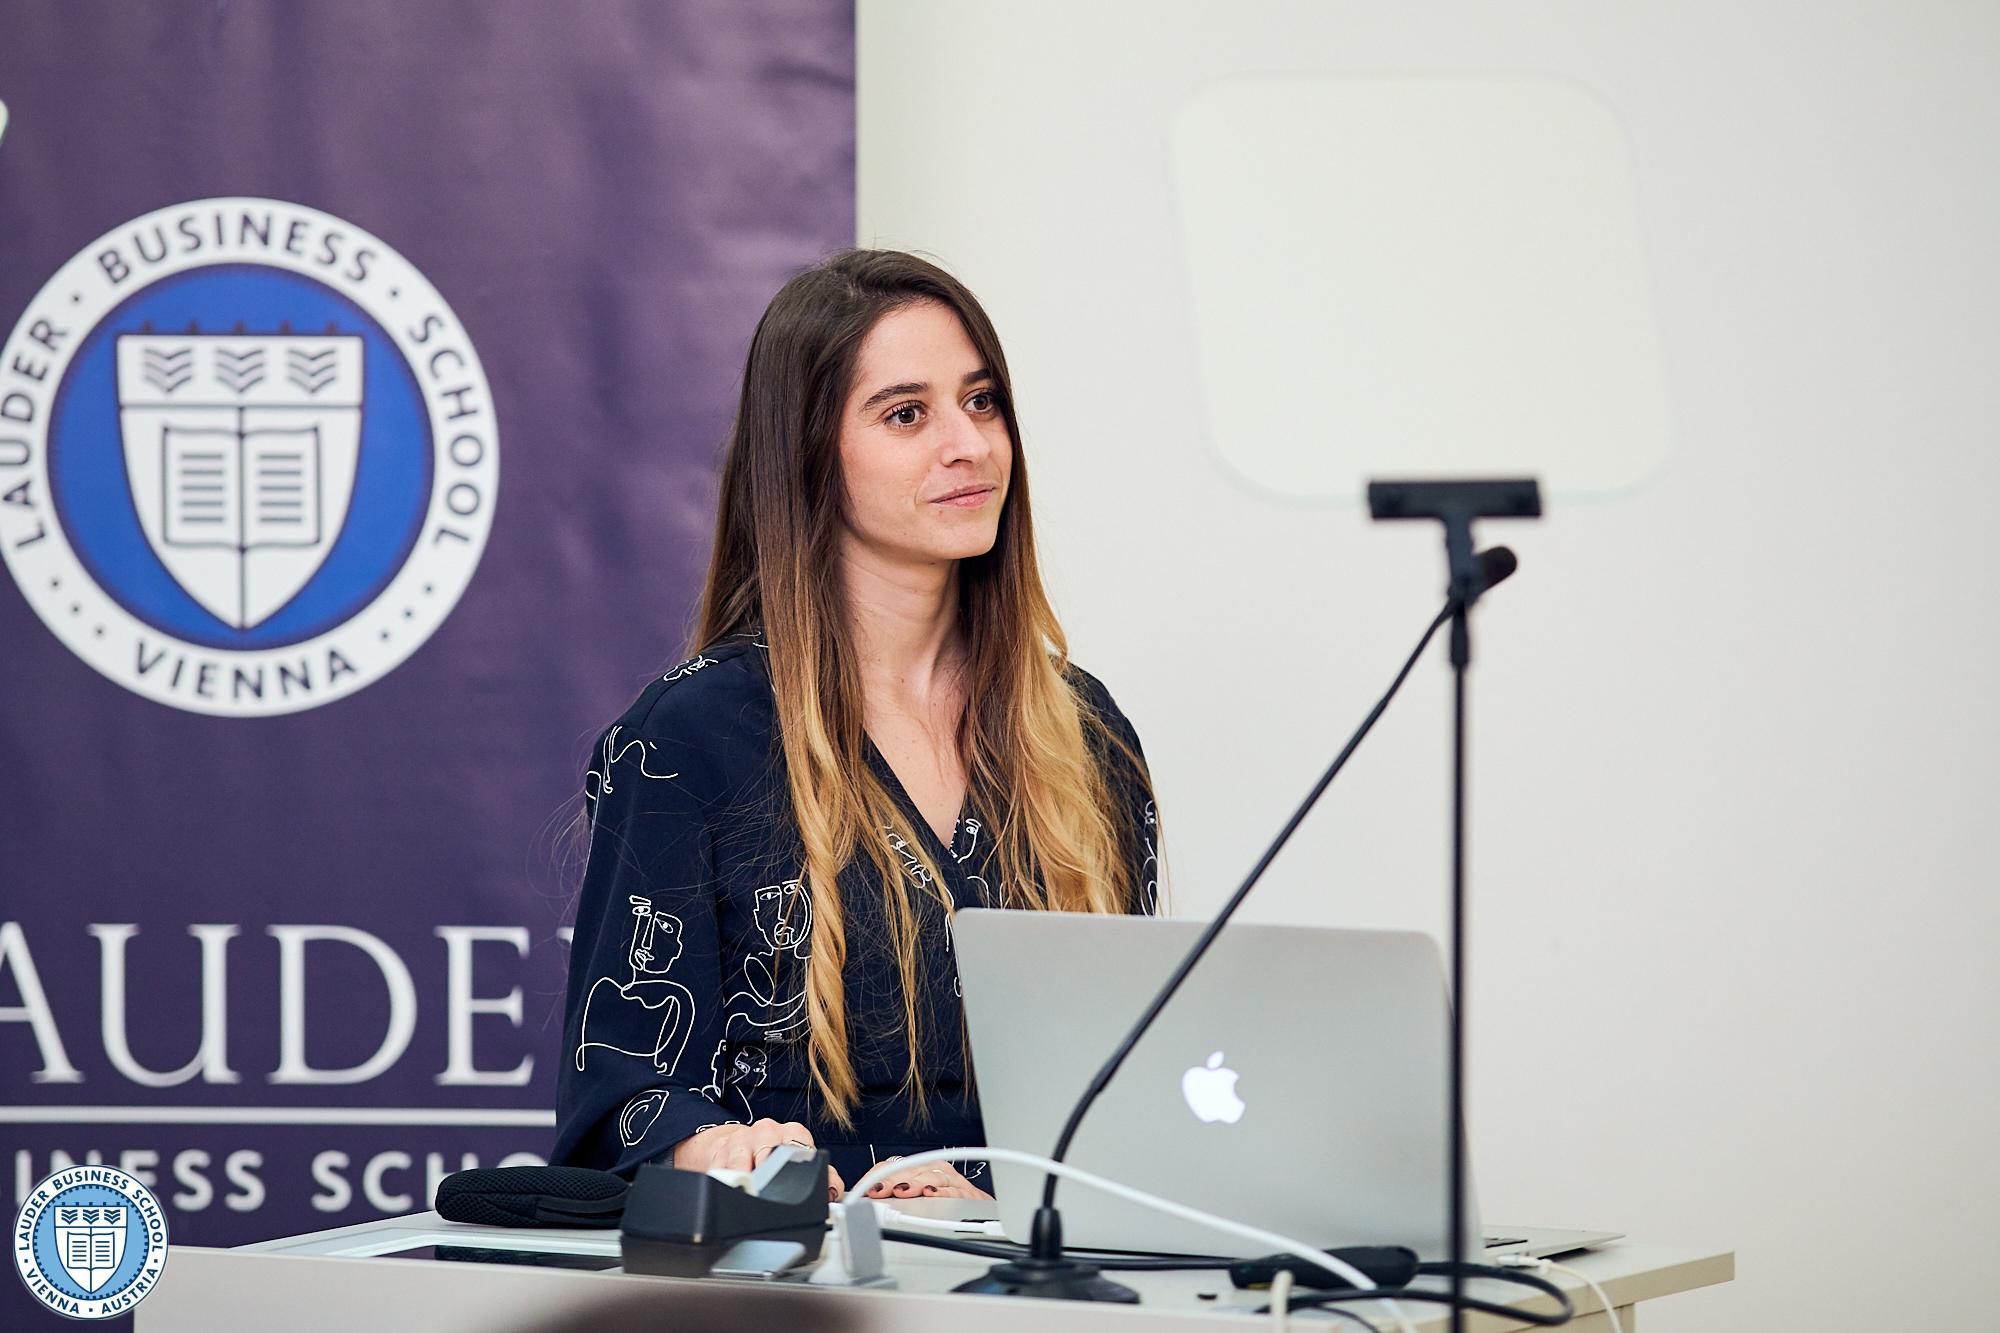 Paz Barsky, BA Student